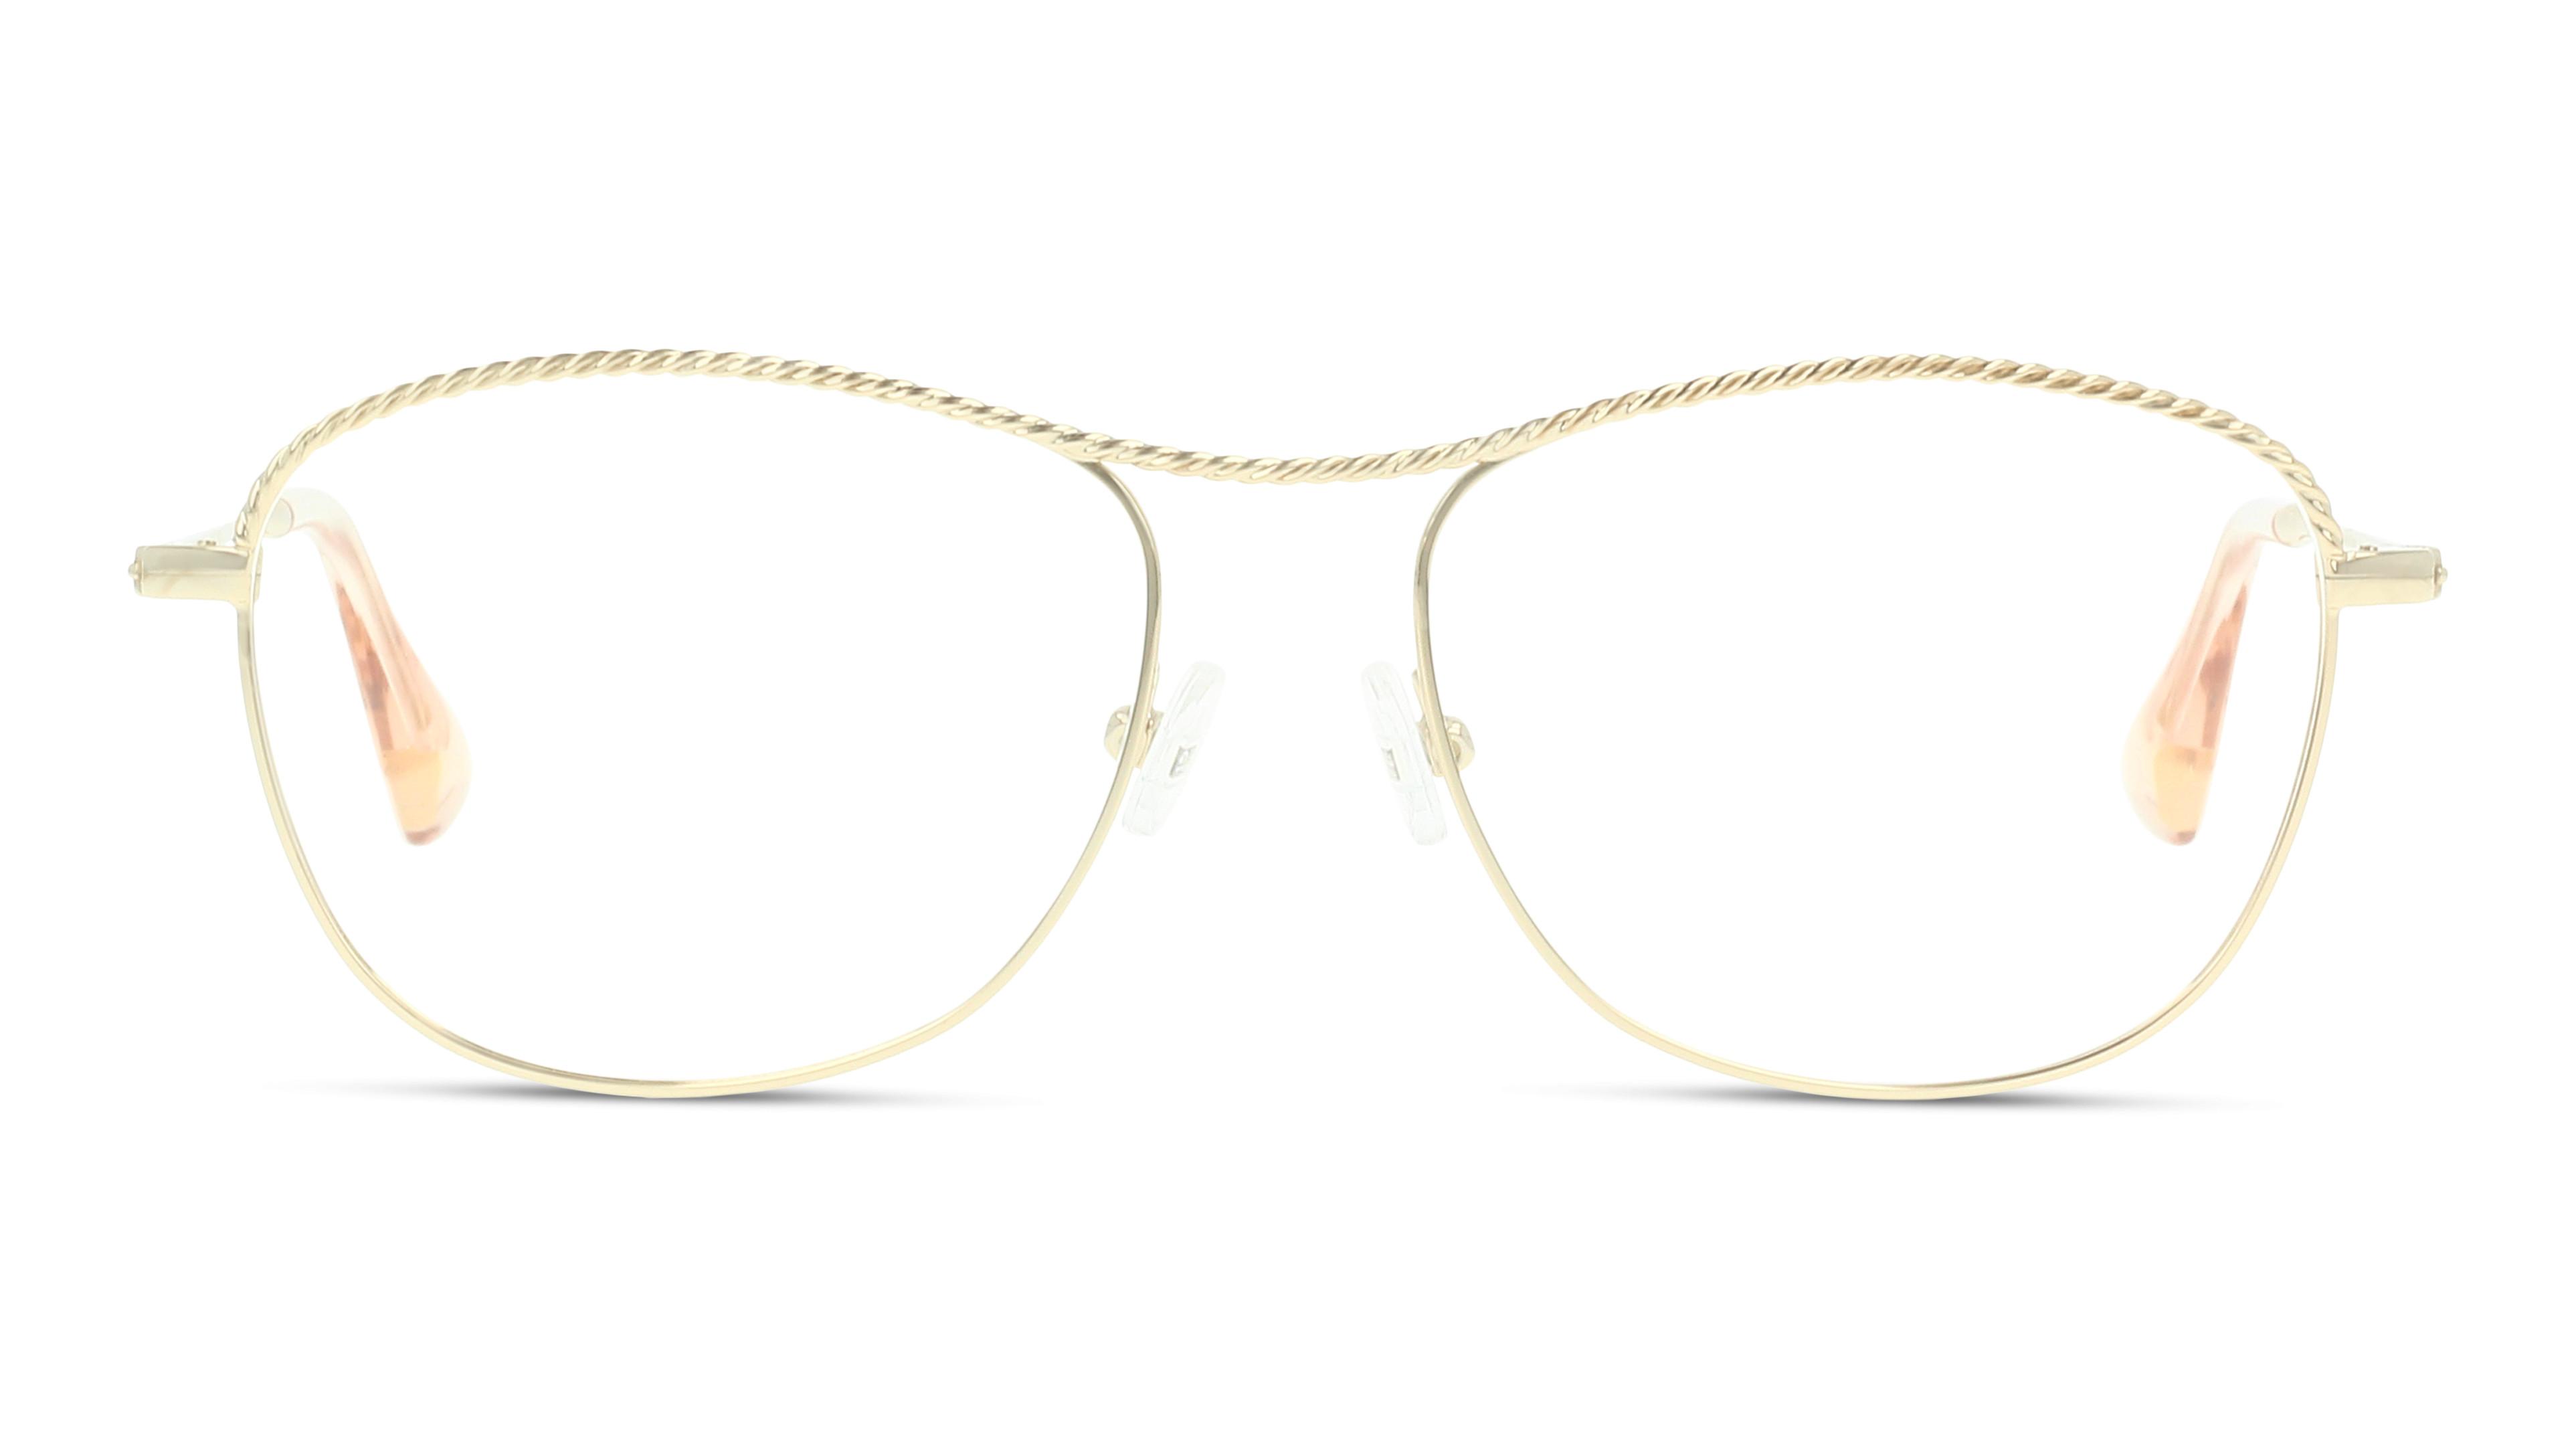 8719154573989-front-01-sensaya-sykf09-eyewear-gold